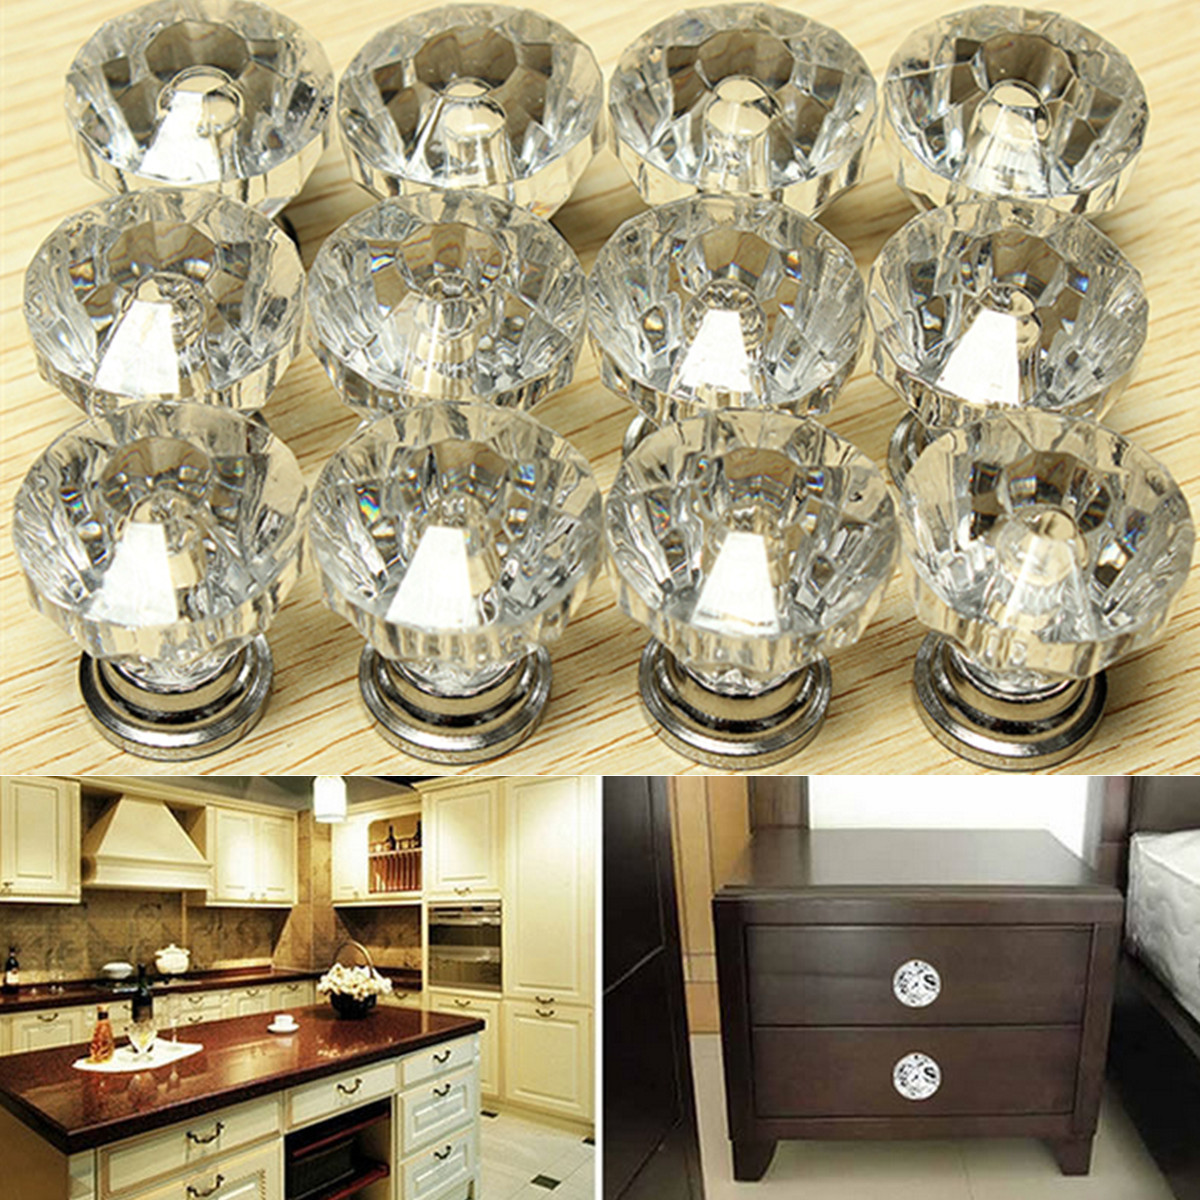 Pack of 12 Drawer Knob Pull Handle Crystal Dresser Glass ...